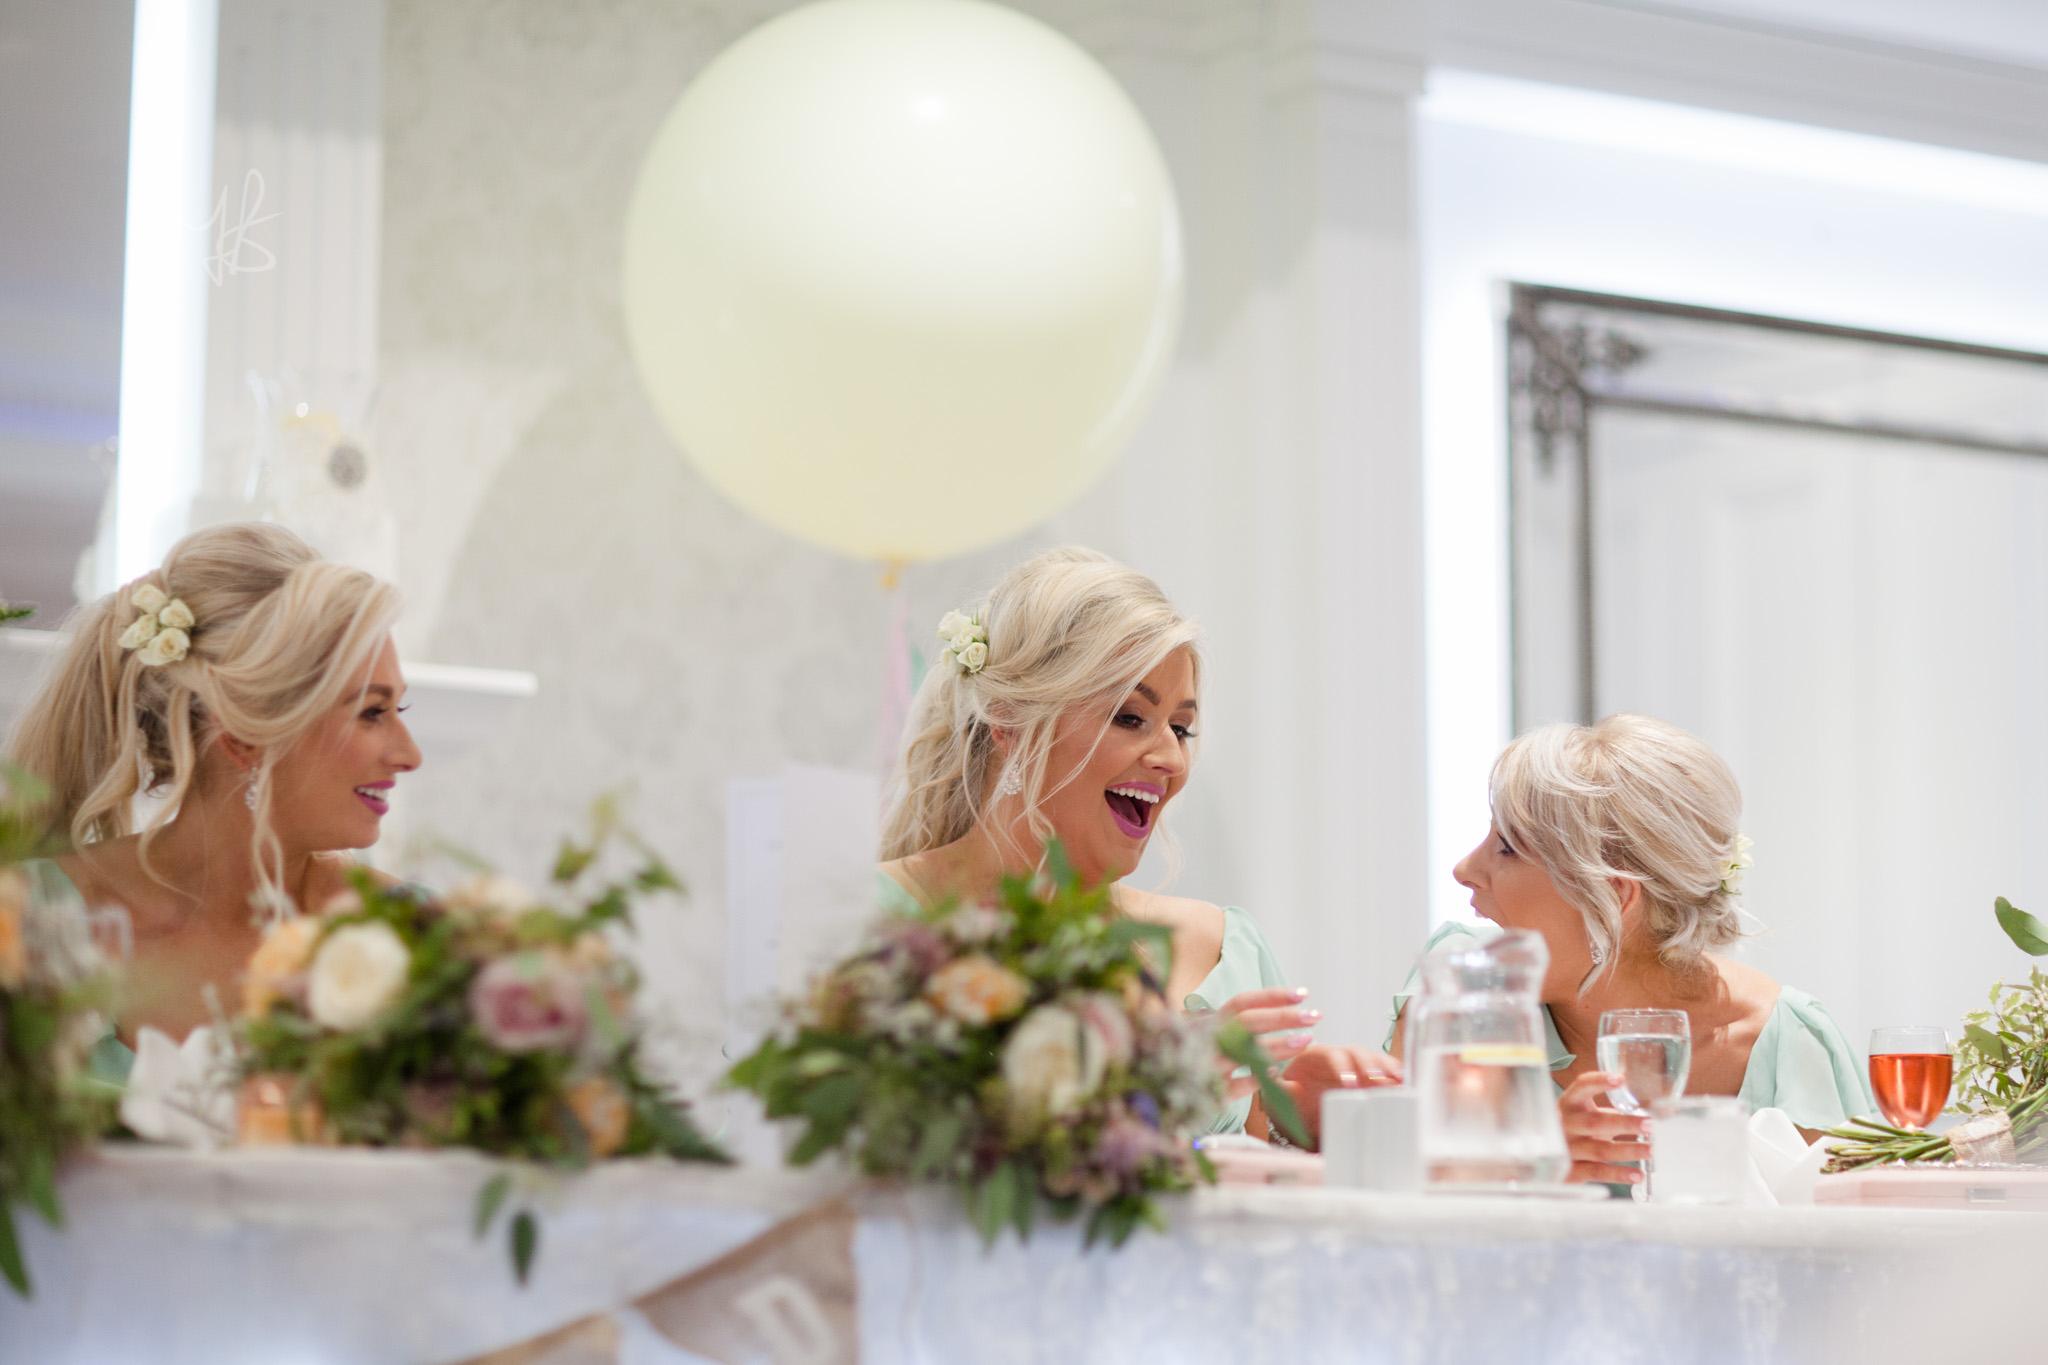 Northern-Ireland-Wedding-Photographer-Mark-Barnes-Ballymena_wedding-photography-Leighinmohr-House-Seamas_Alanna_For-web-41.jpg